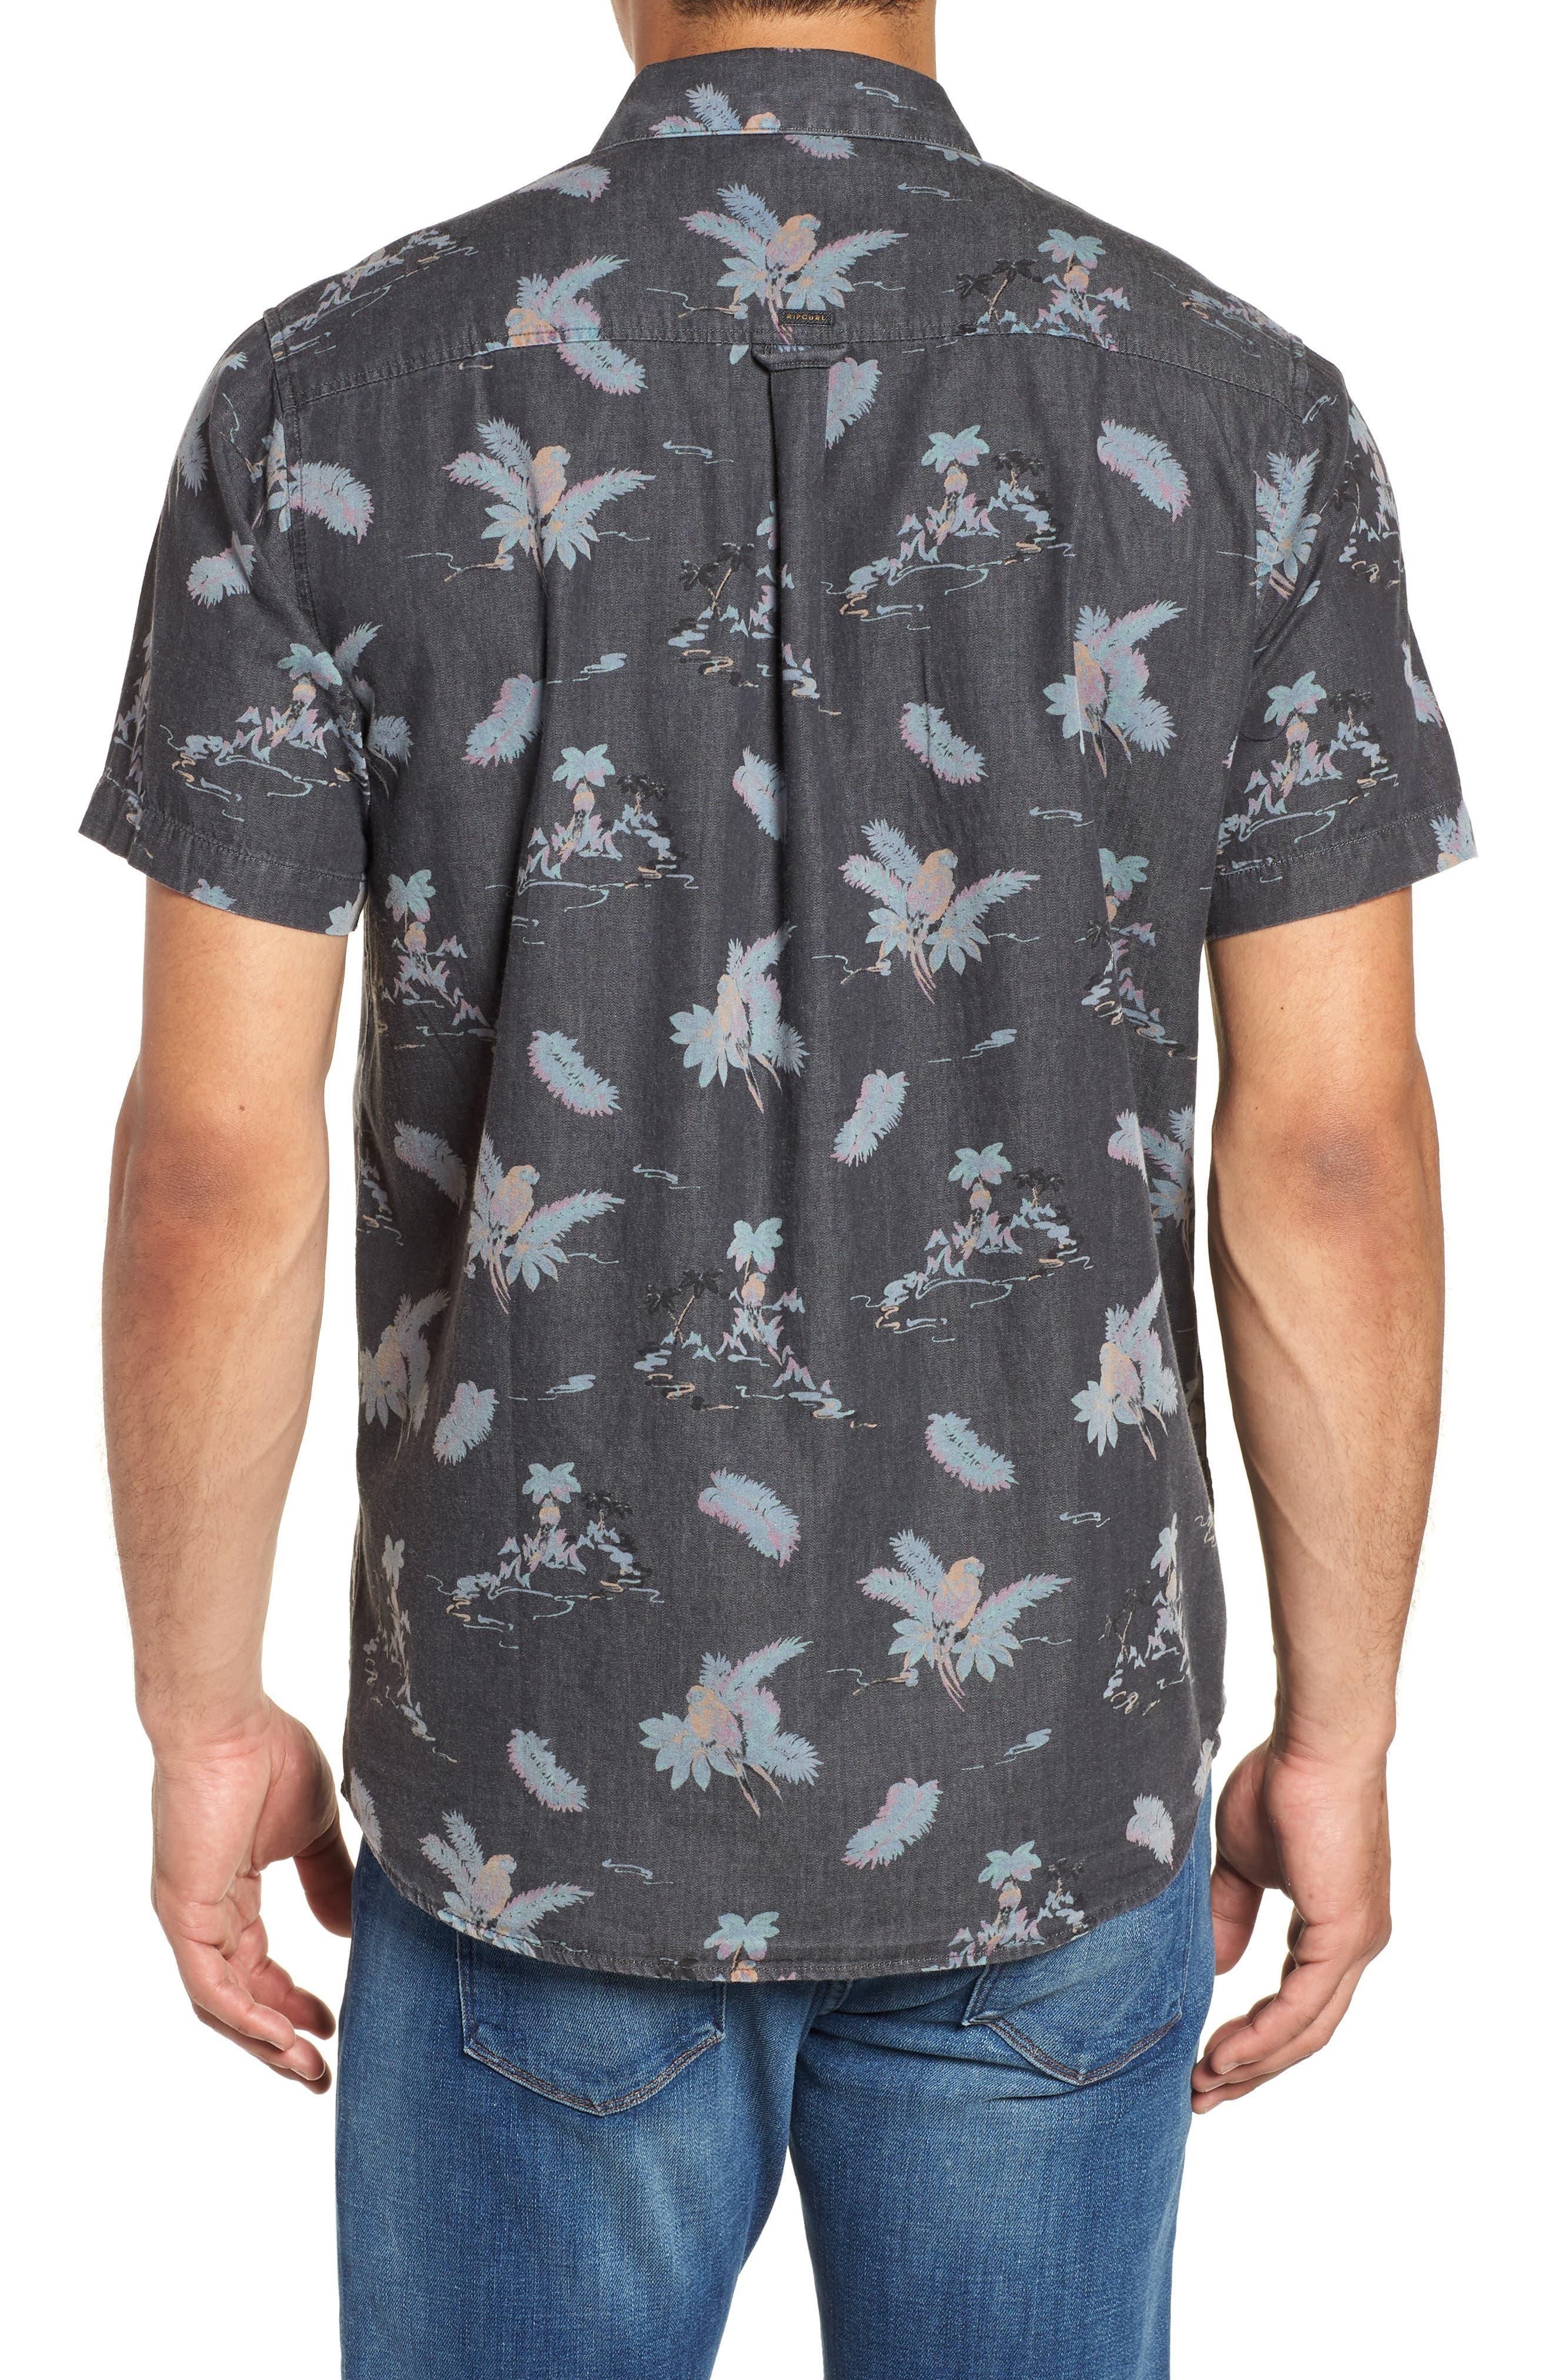 Meledrone Woven Shirt,                             Alternate thumbnail 3, color,                             Charcoal Grey